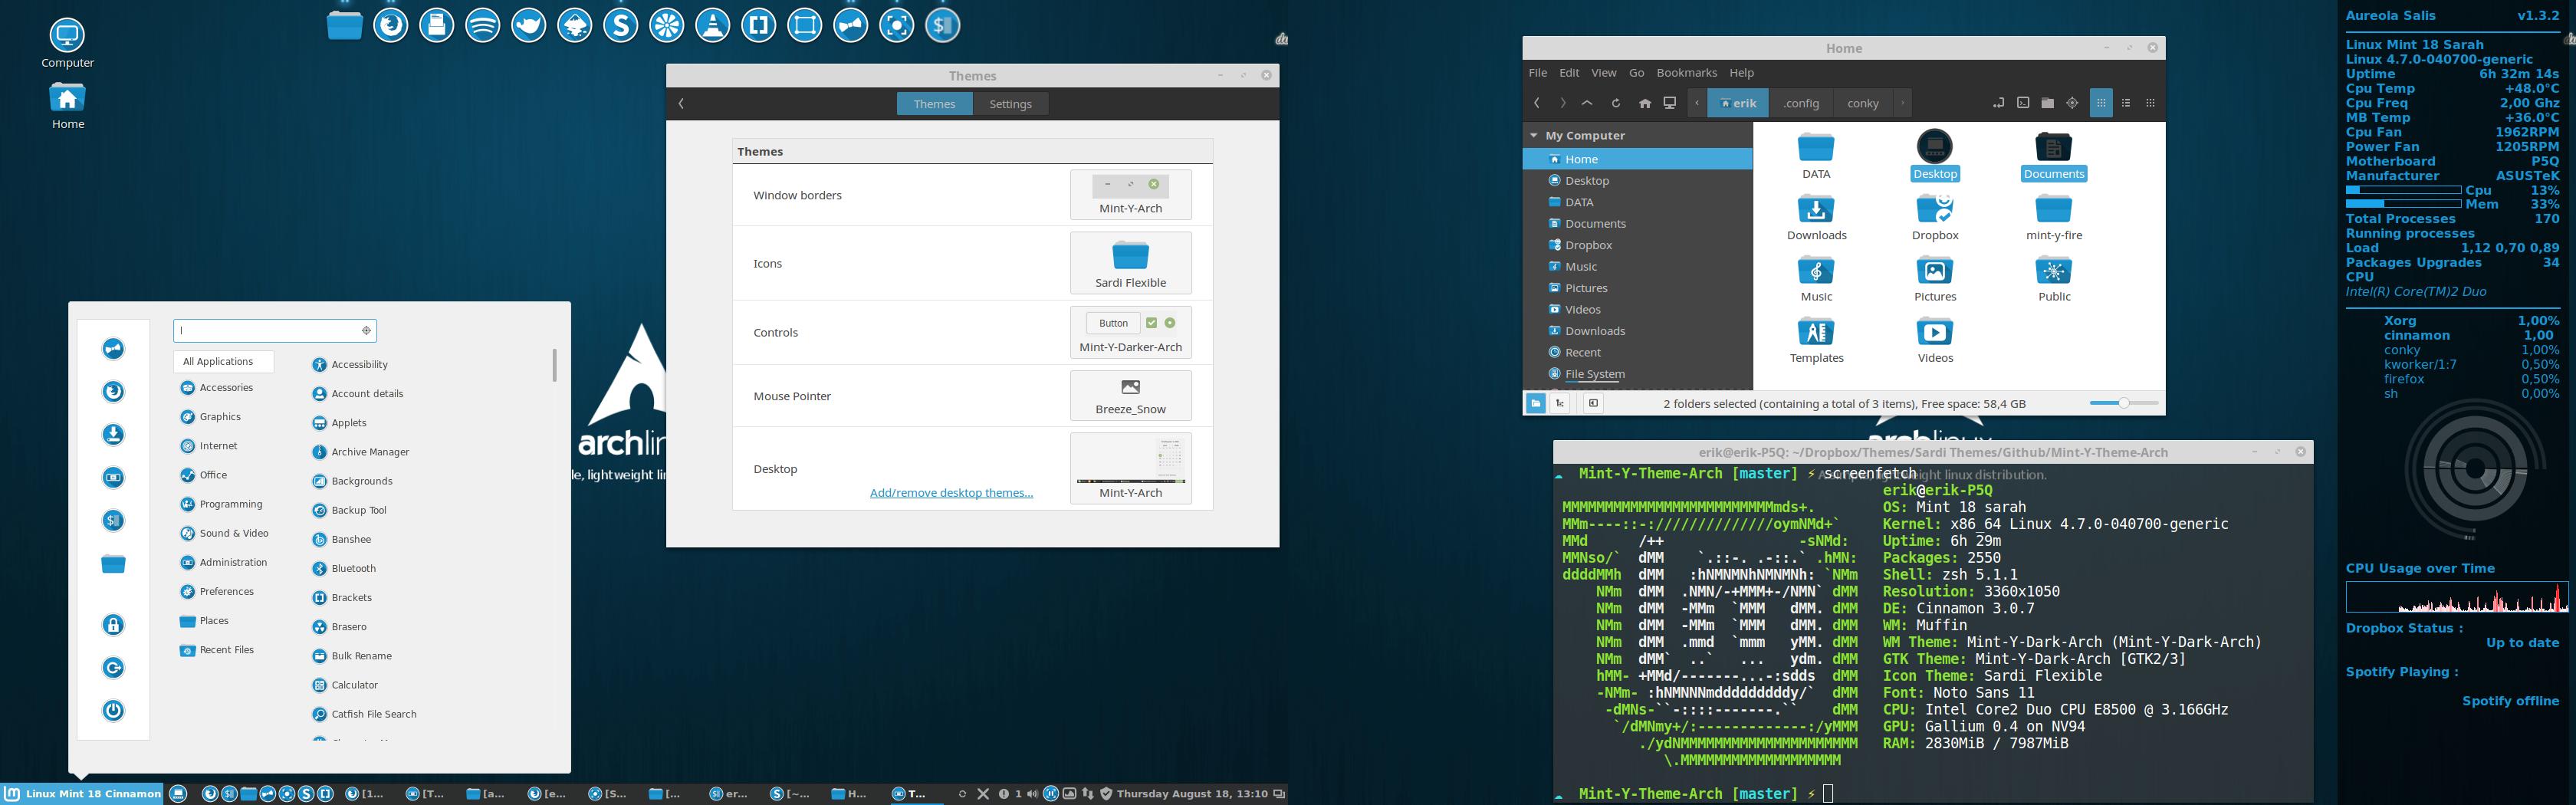 Linux Mint Themes